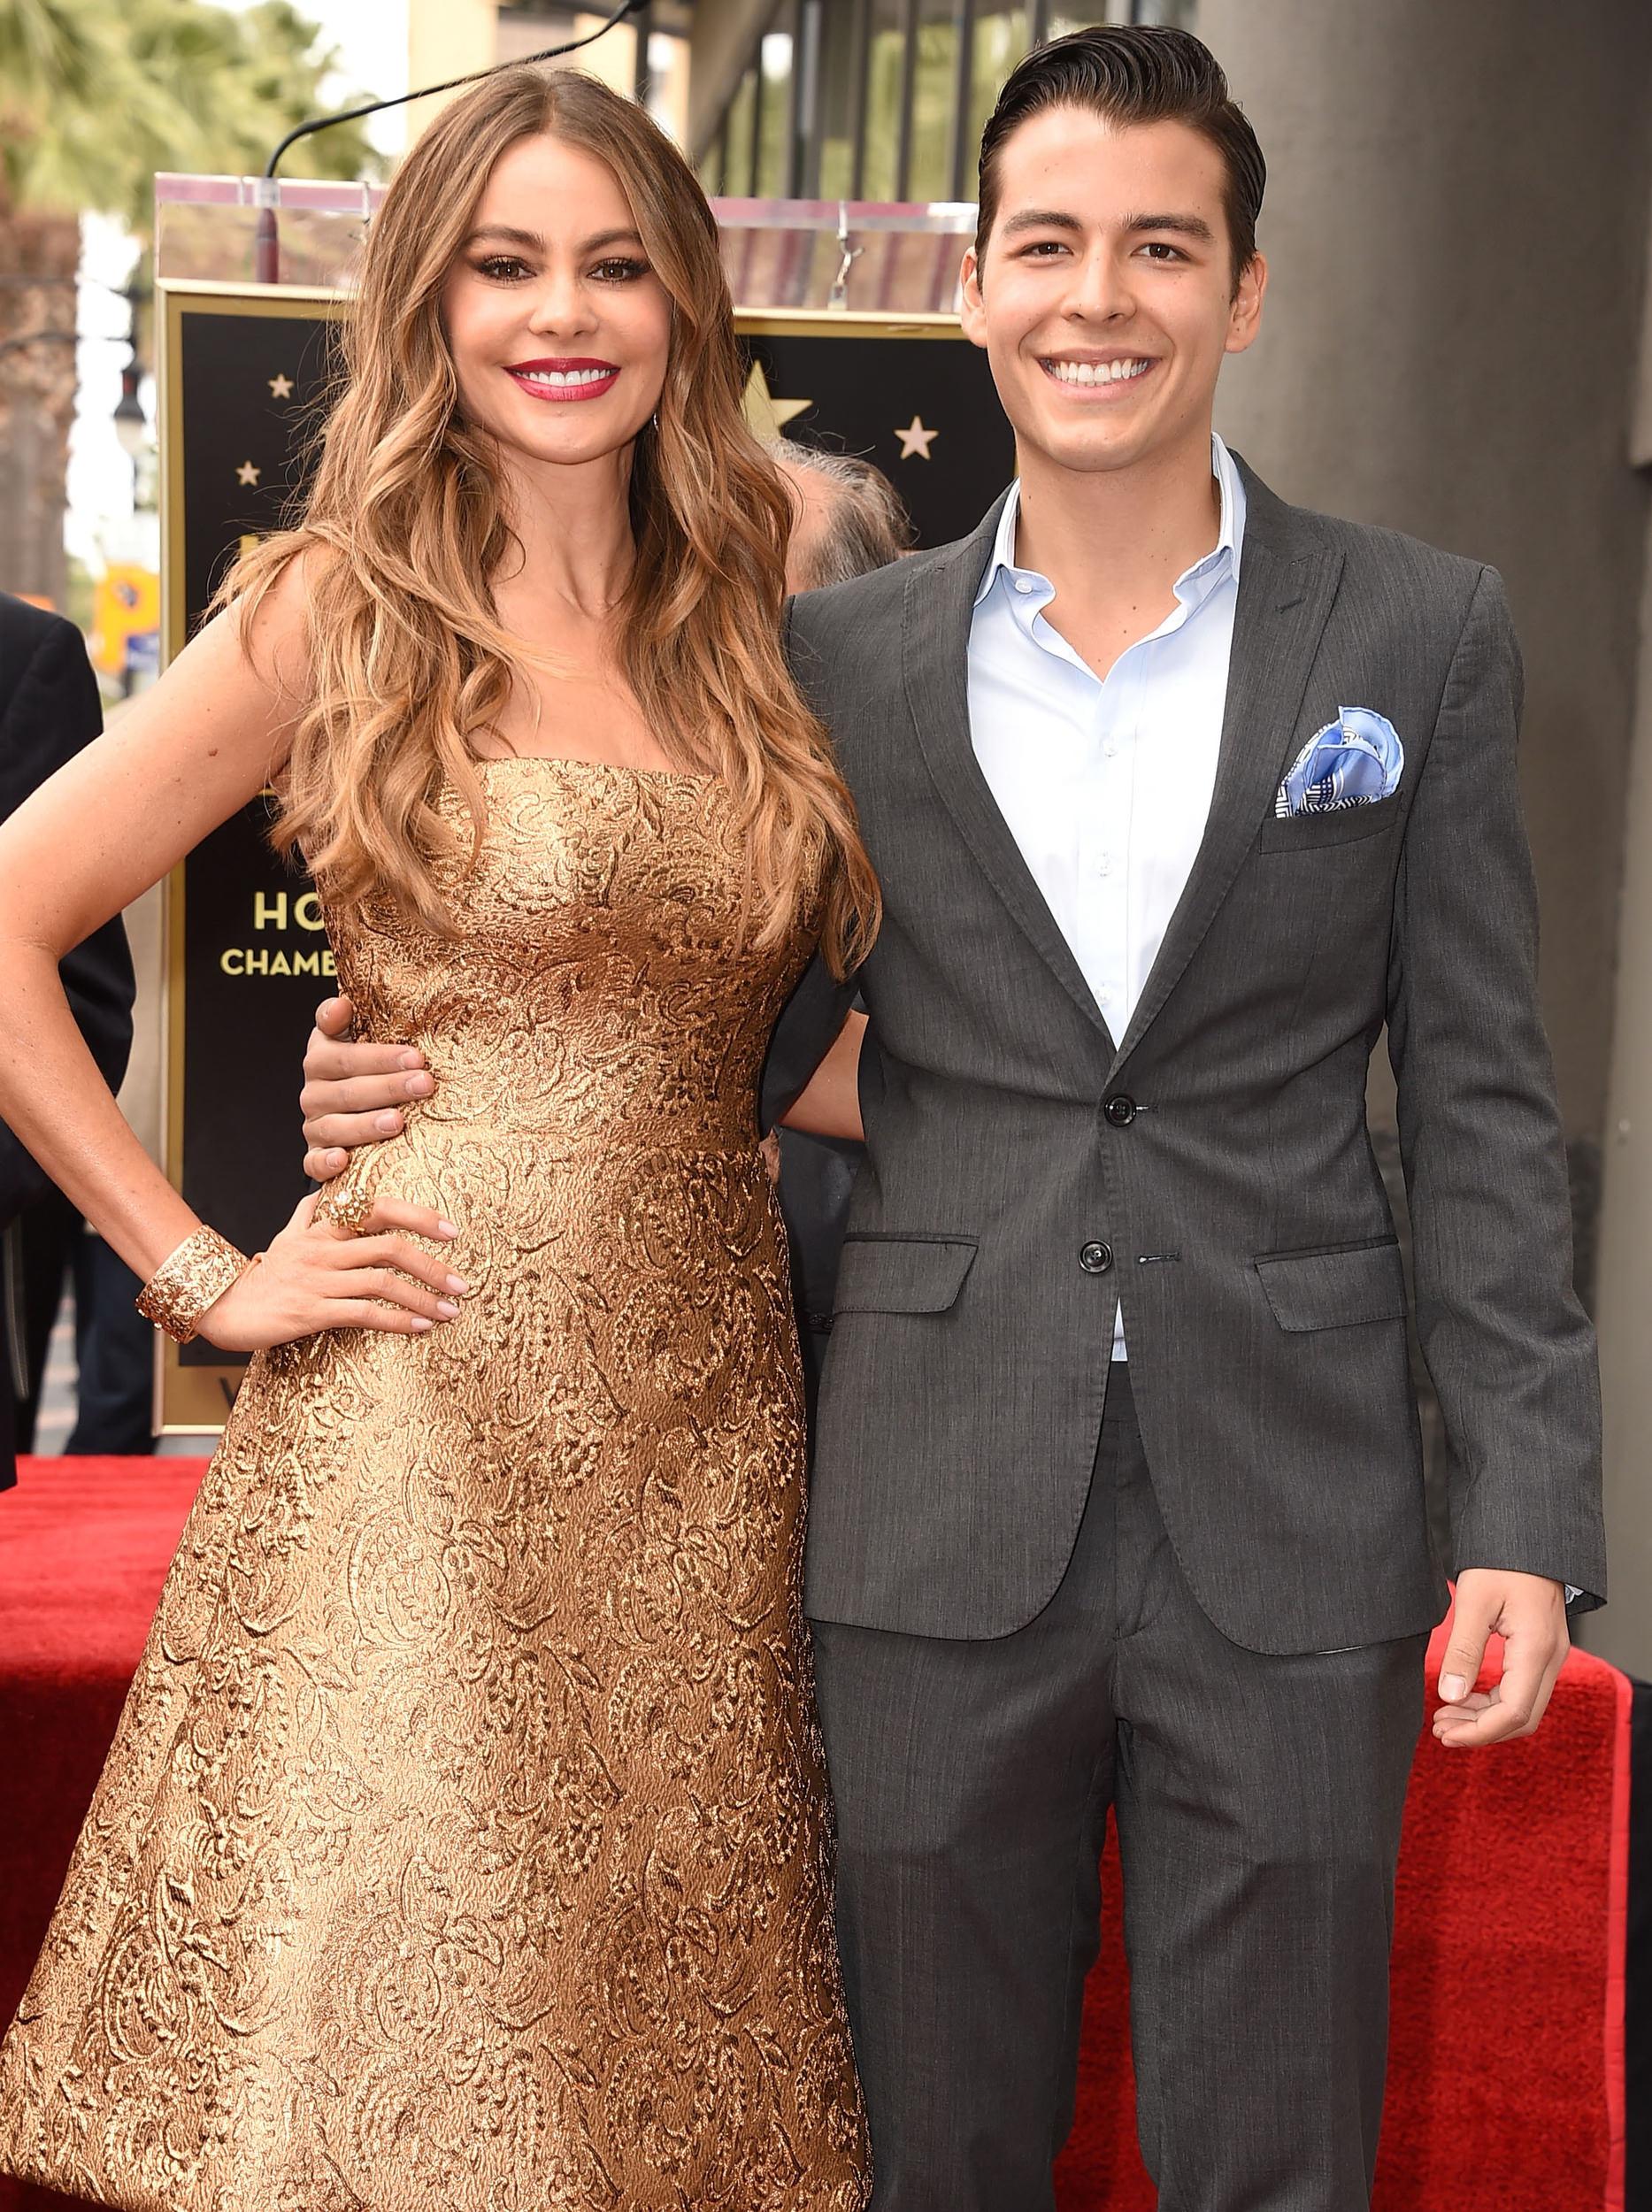 19 - Sofia Vergara and her son Manolo.